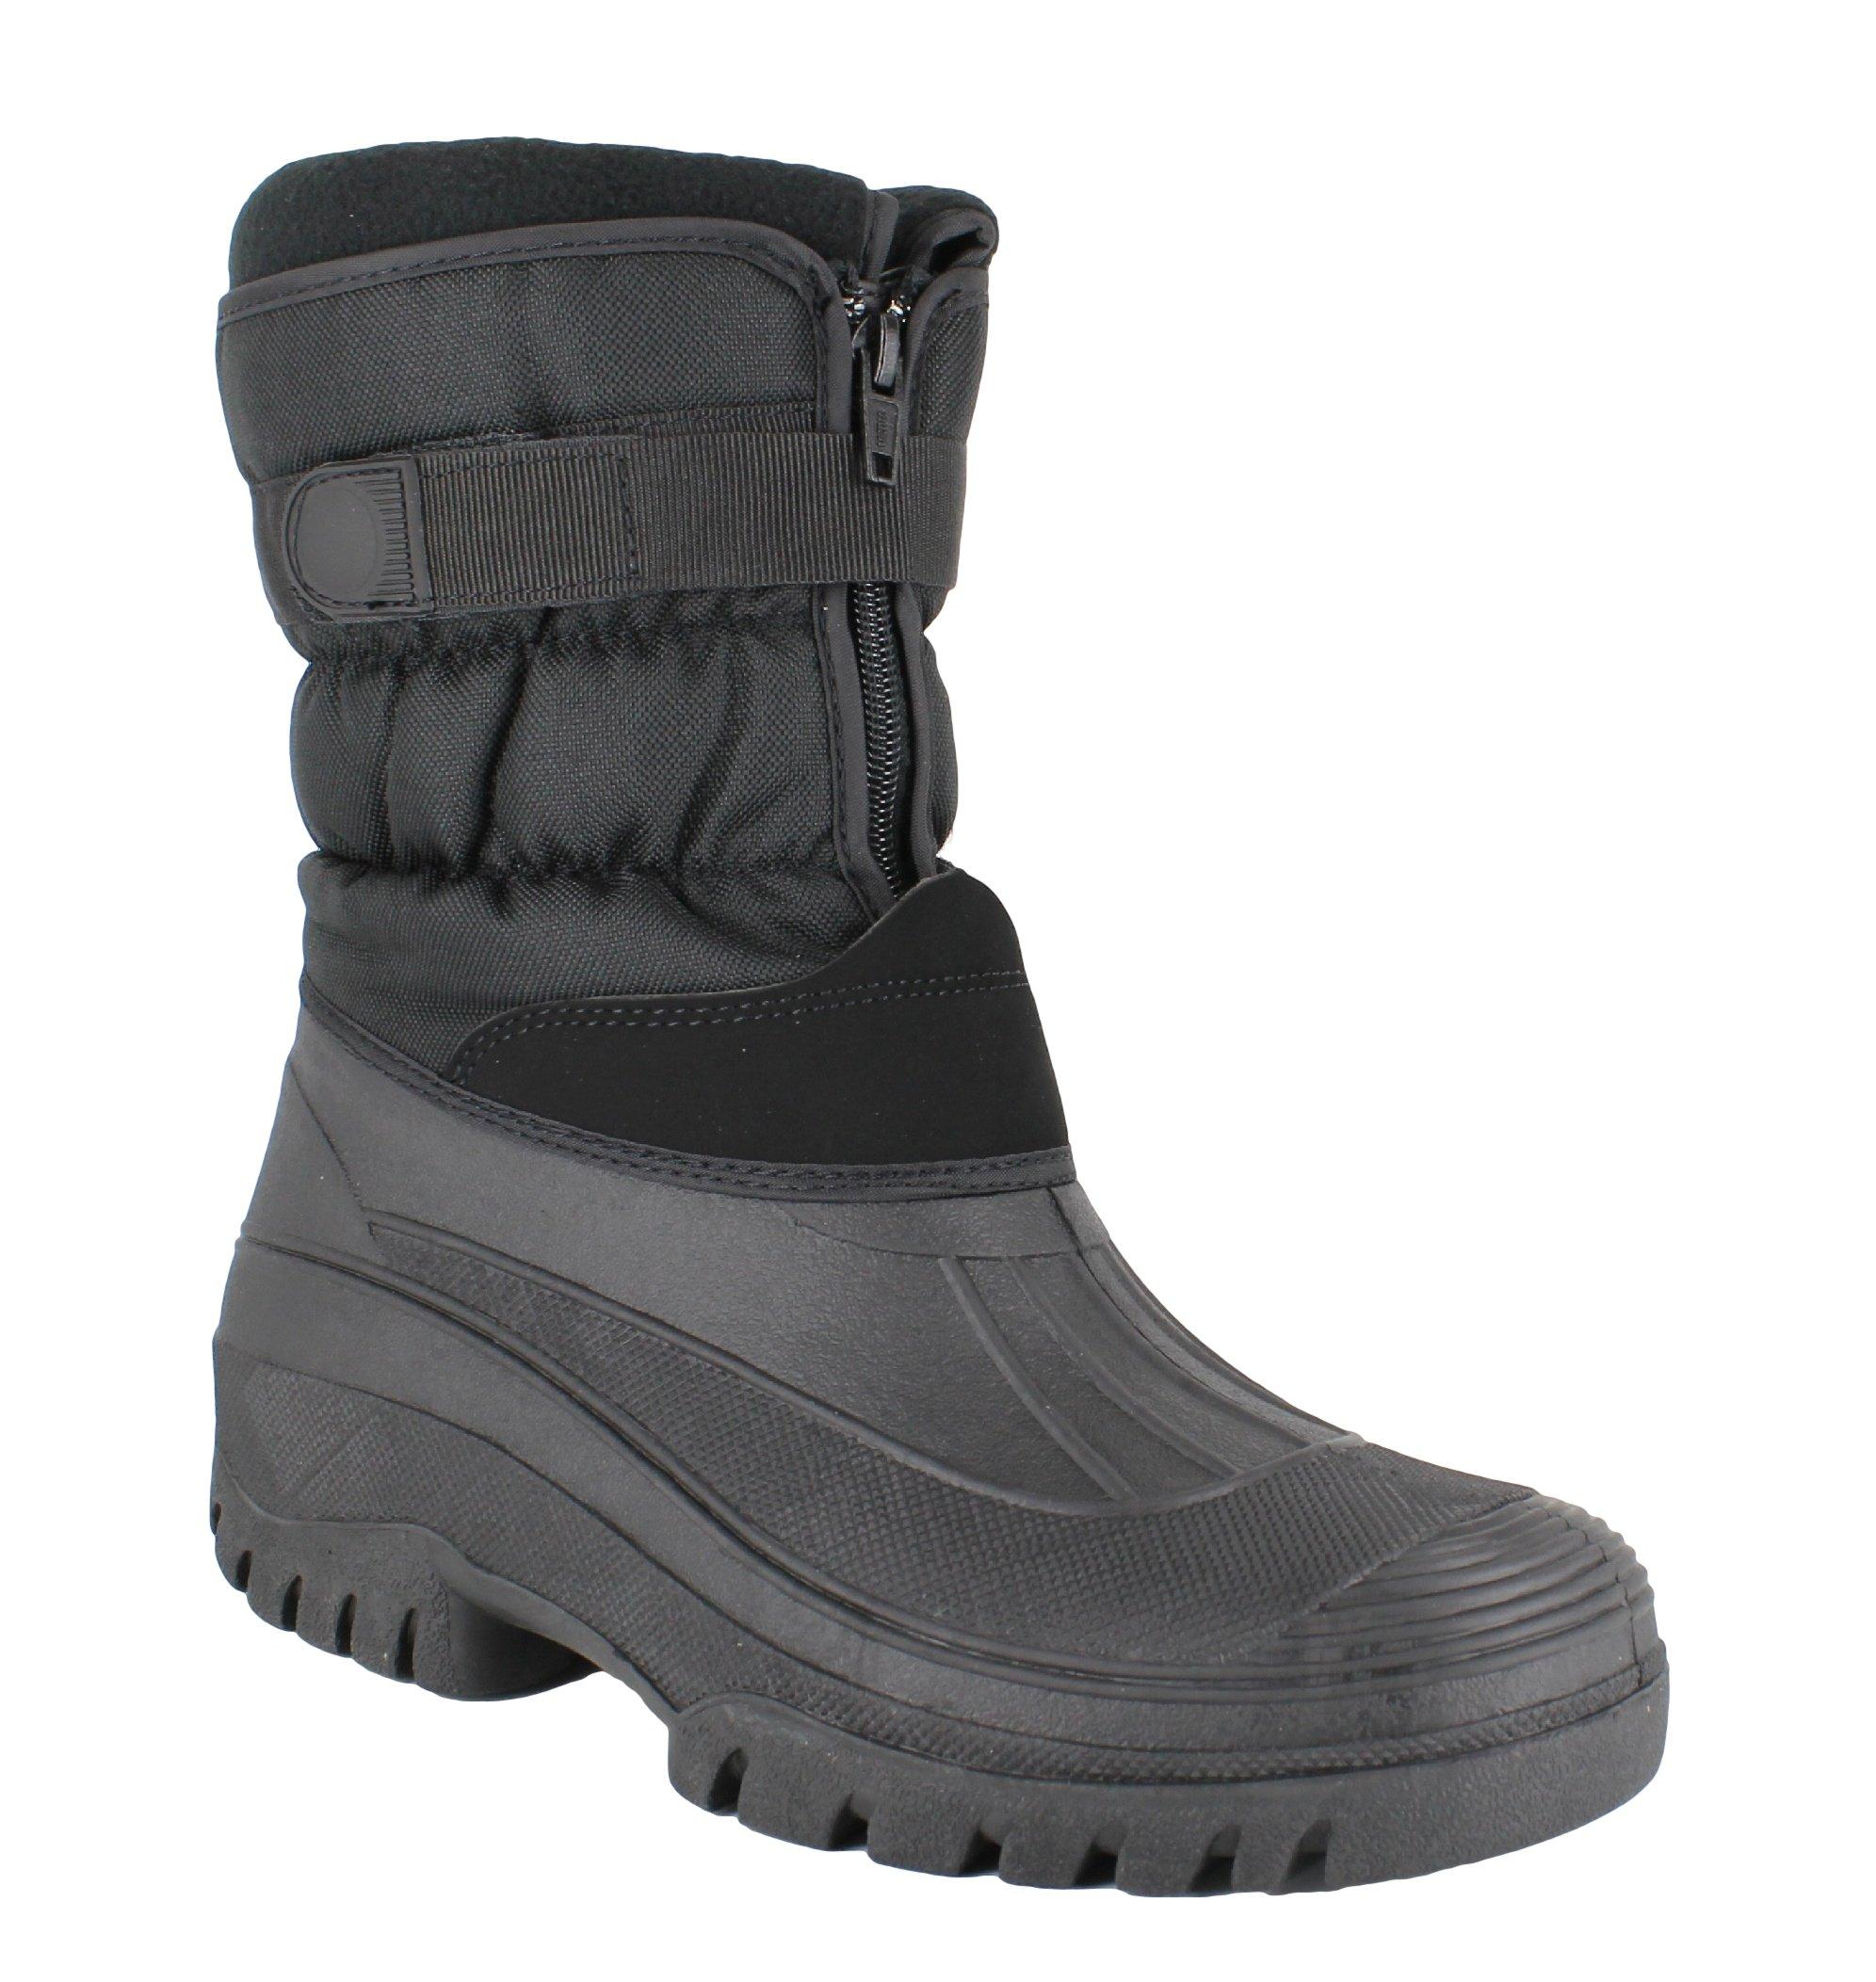 GroundWork Womens Navy Mucker Stable Yard Winter Snow Zip Up Boots Wellies